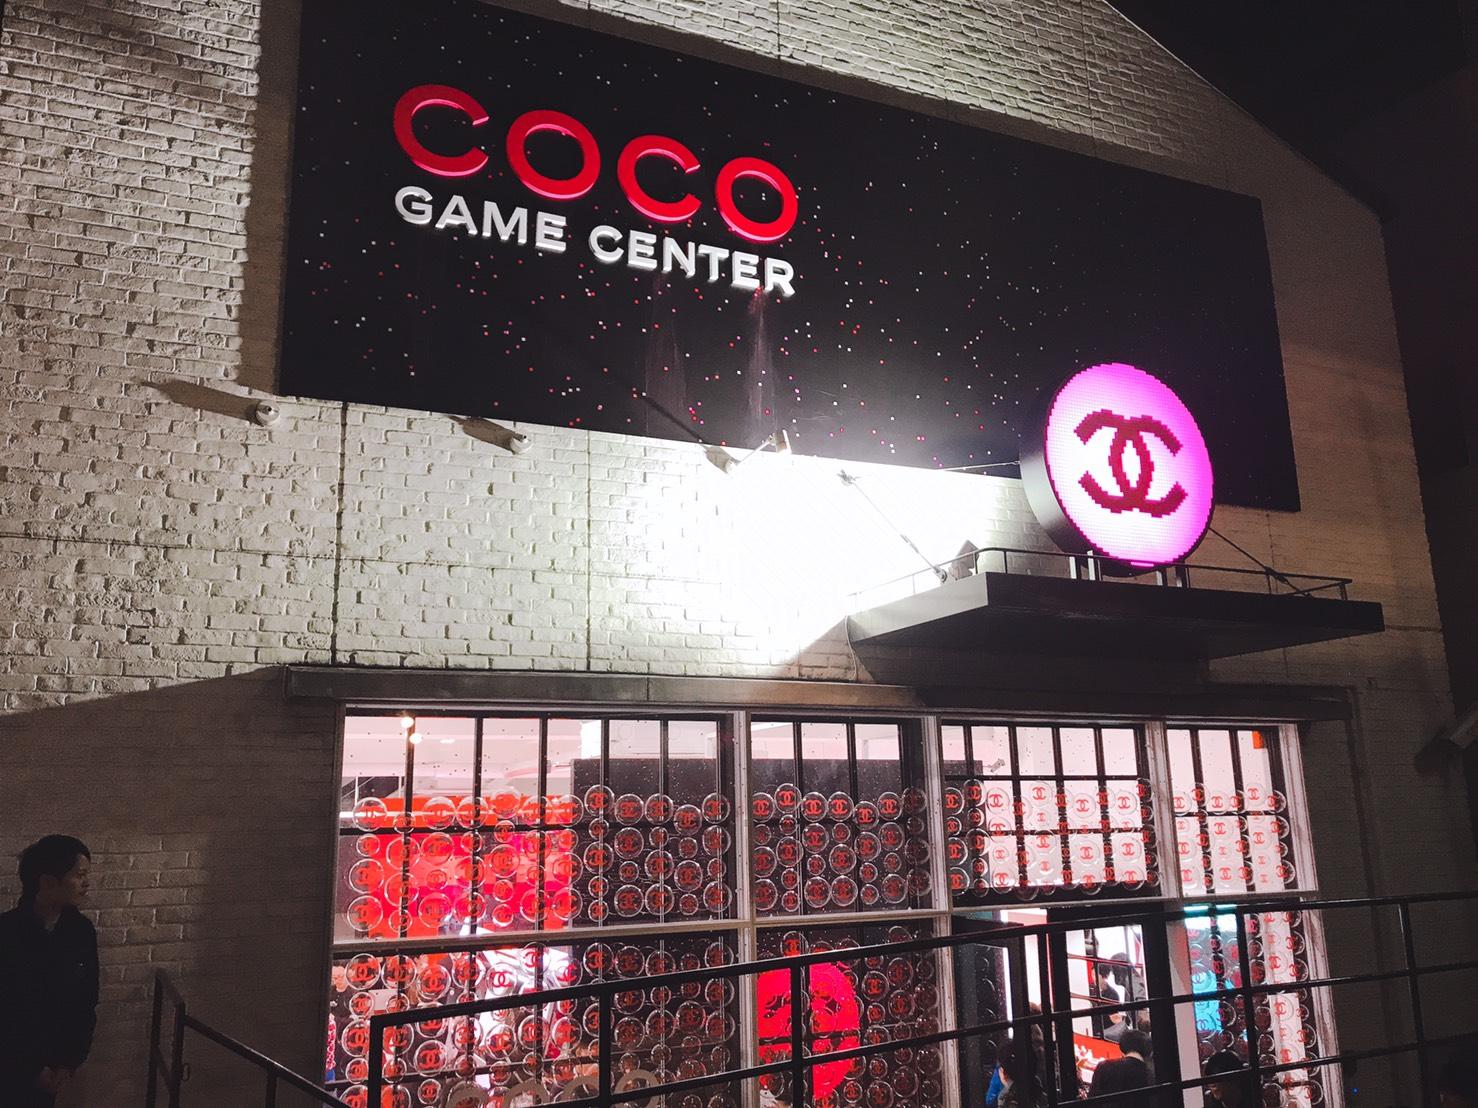 COCO GAME CENTER